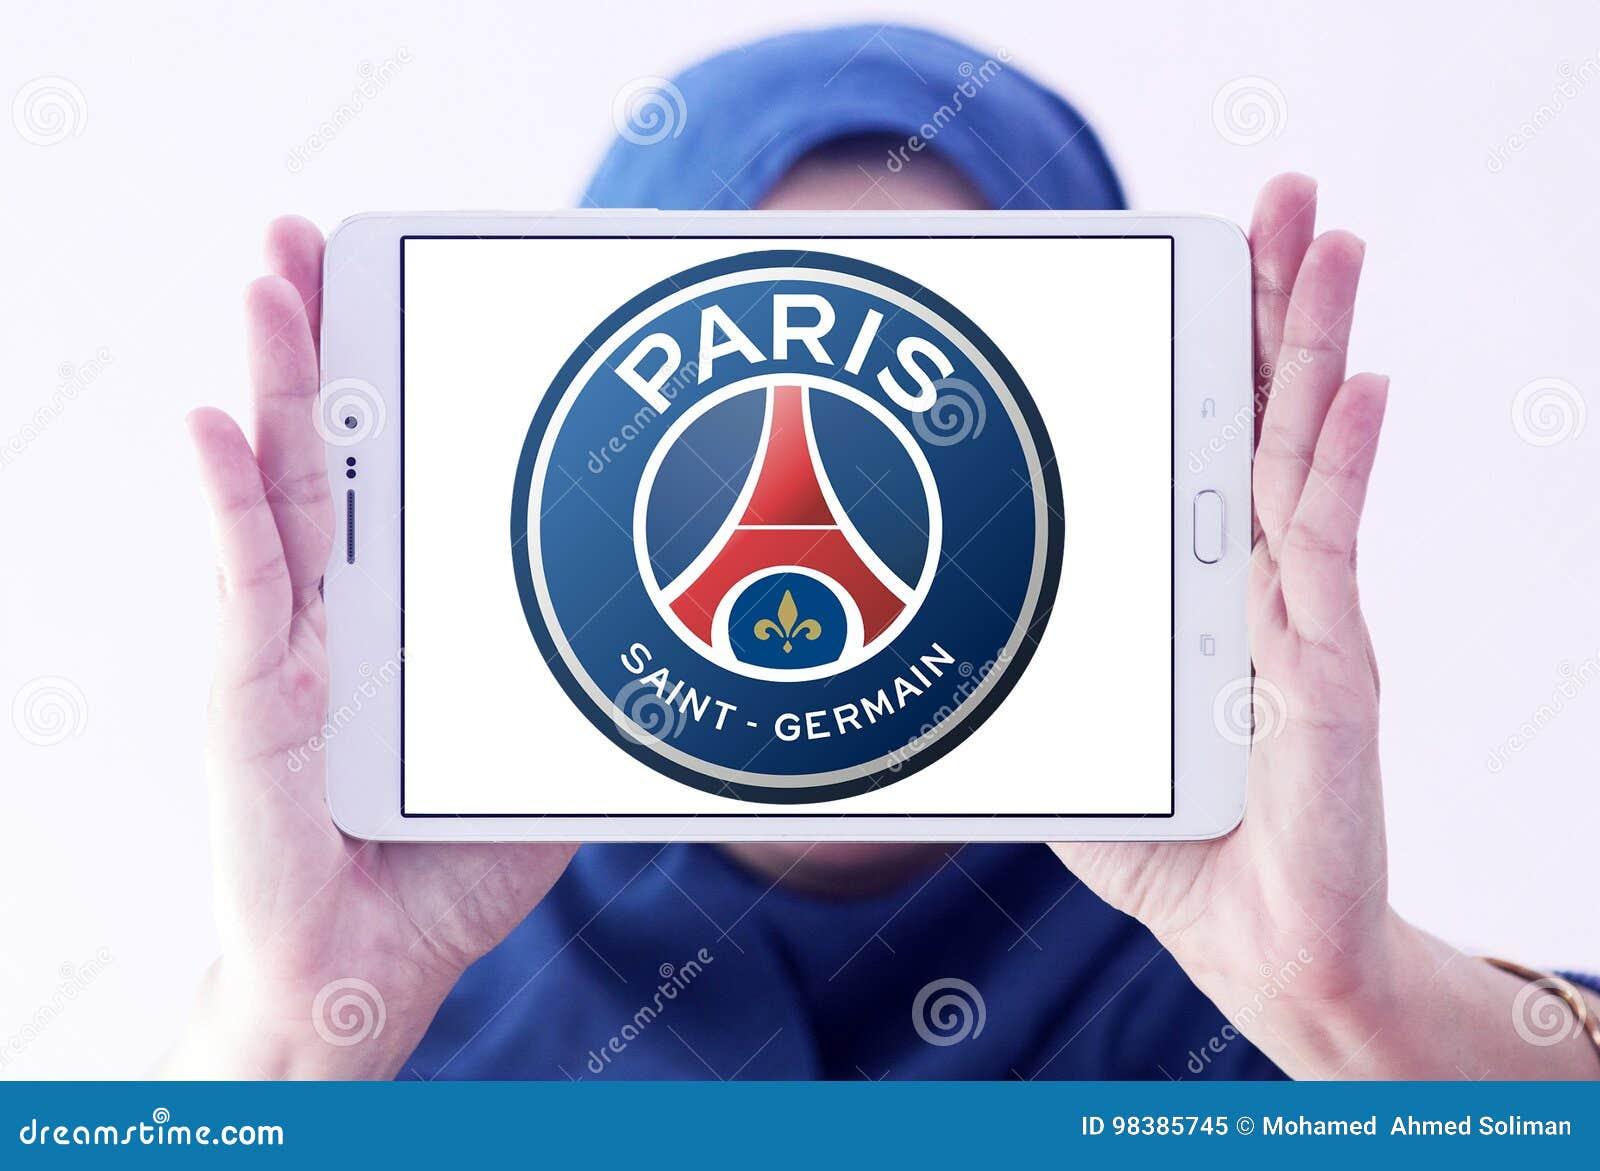 Paris Saint Germain Psg Football Club Logo Editorial Image Image Of Icons Brands 98385745